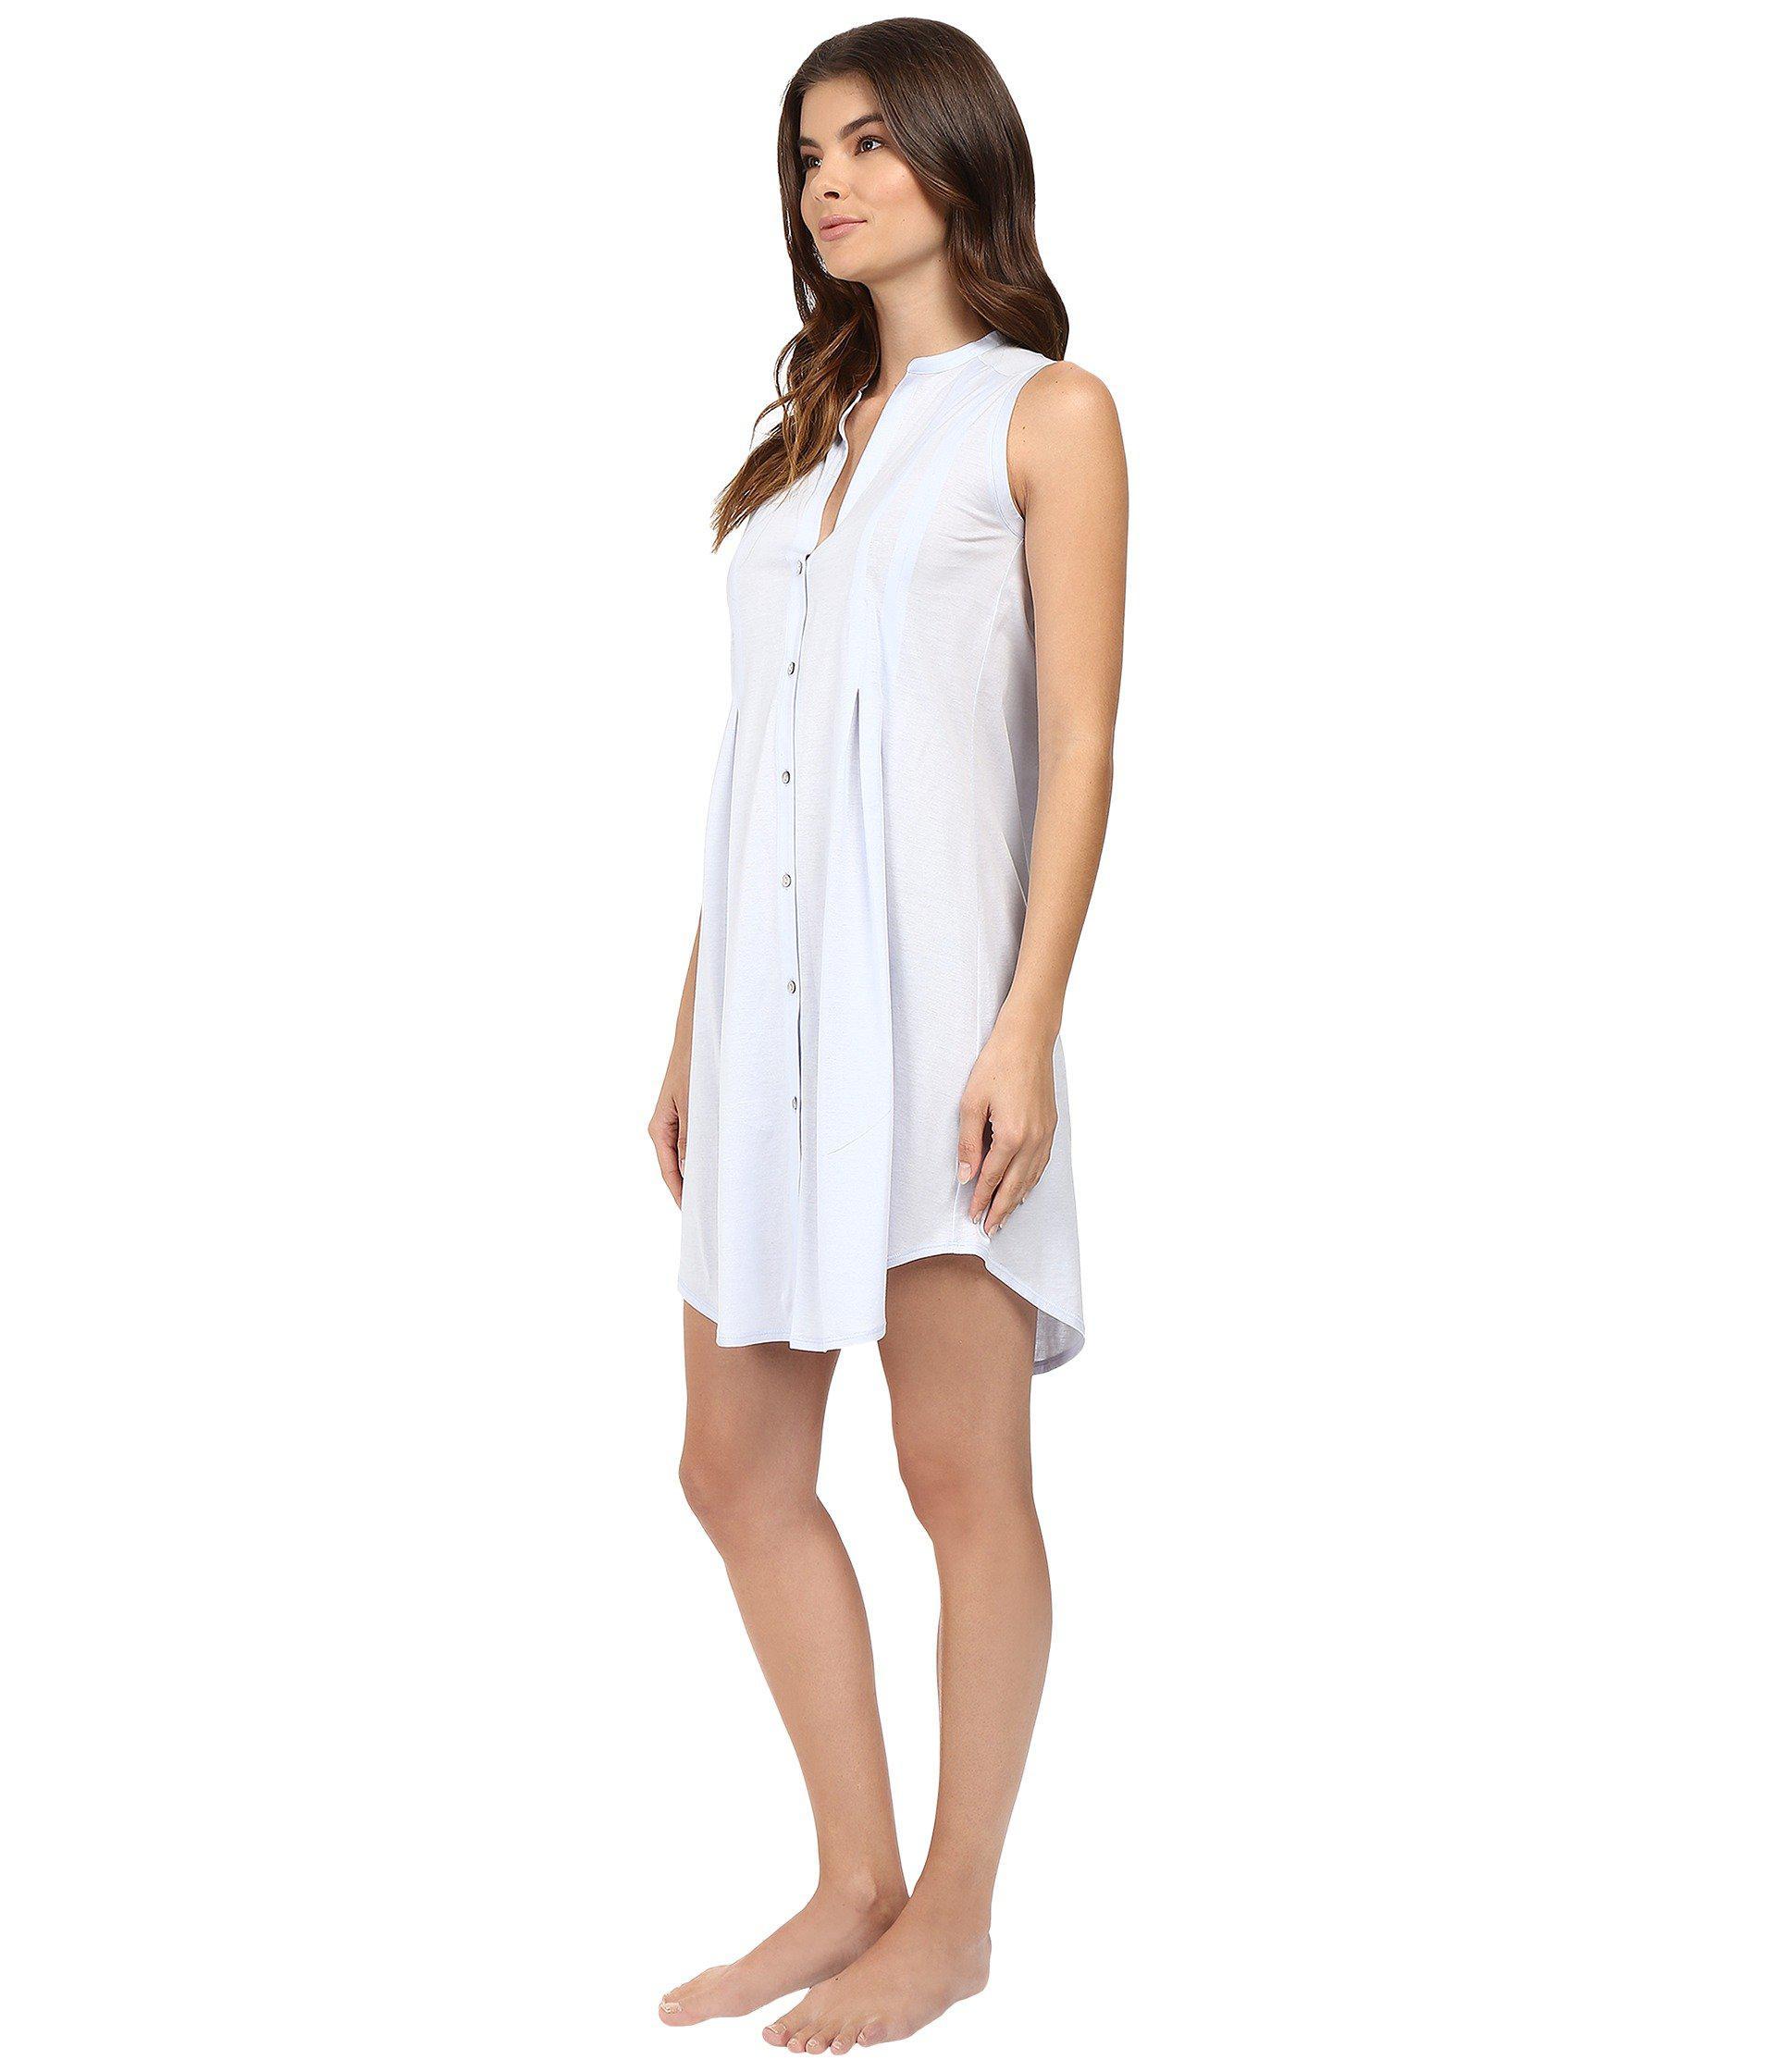 de41518380 Lyst - Hanro Cotton Deluxe Button Front Tank Nightgown (tender Rose)  Women s Pajama in White